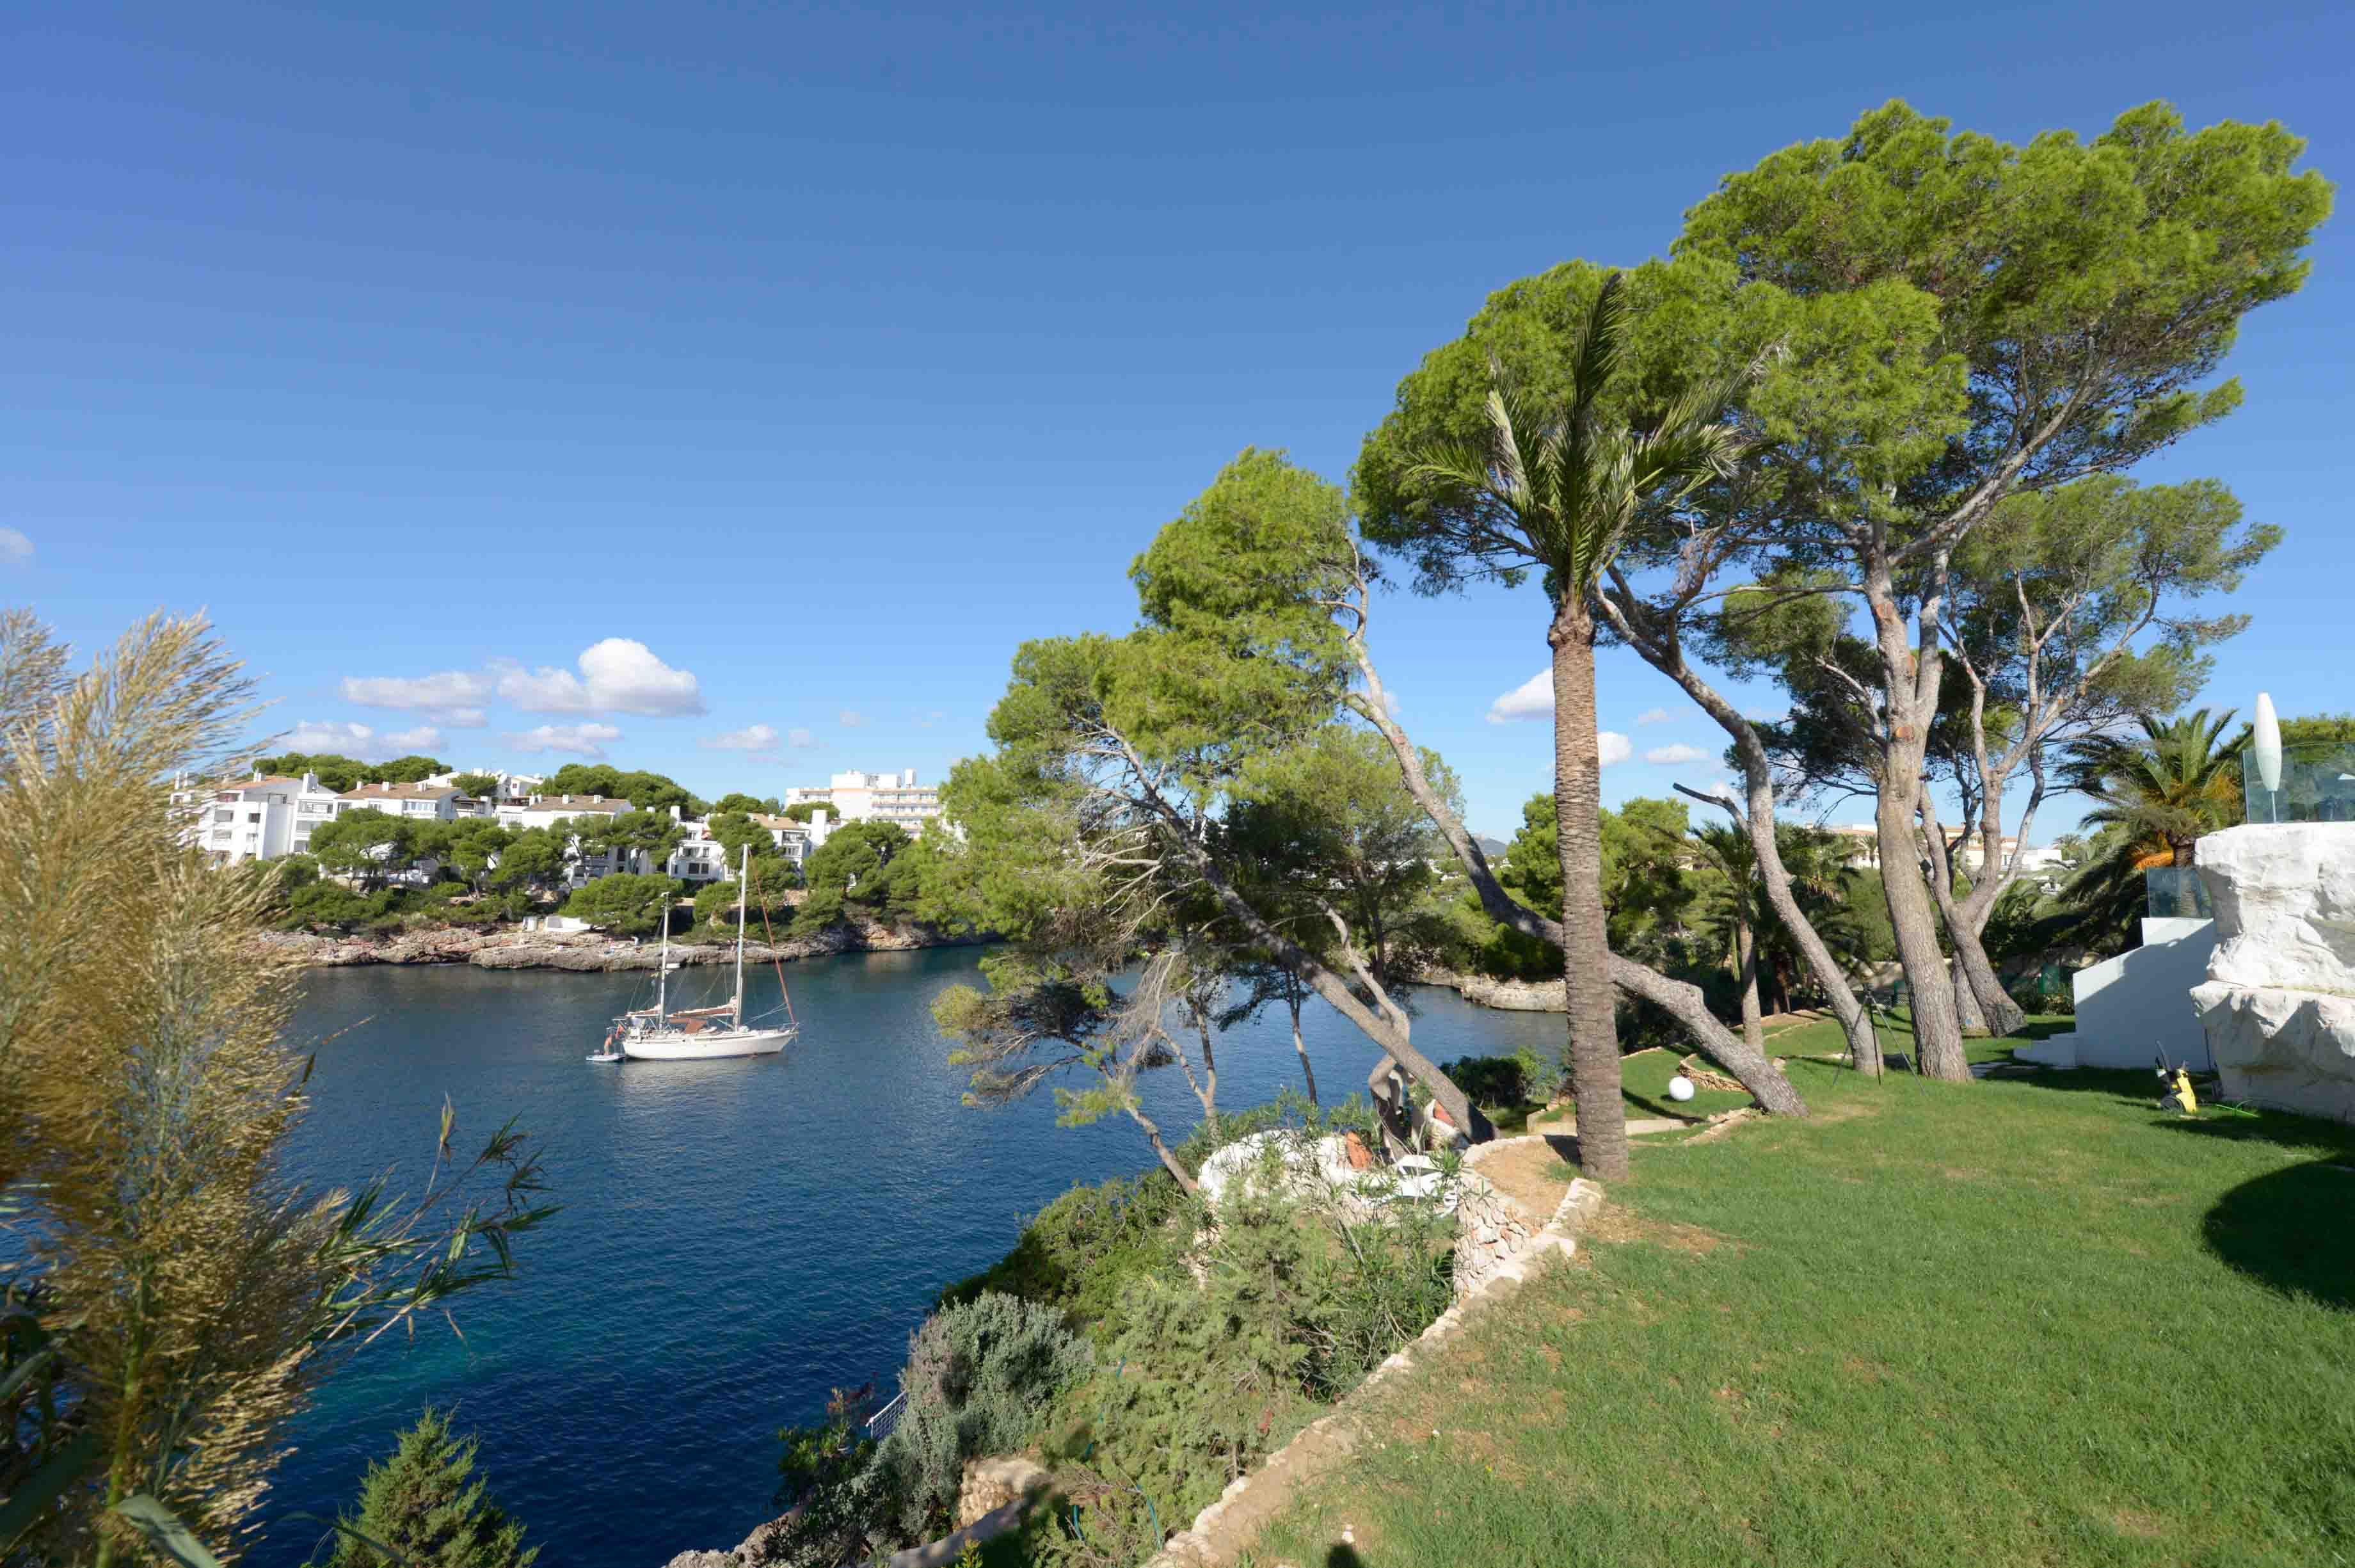 Ferienhaus Mallorca Mit Bootsanleger - Ocean Villa Cala Serena